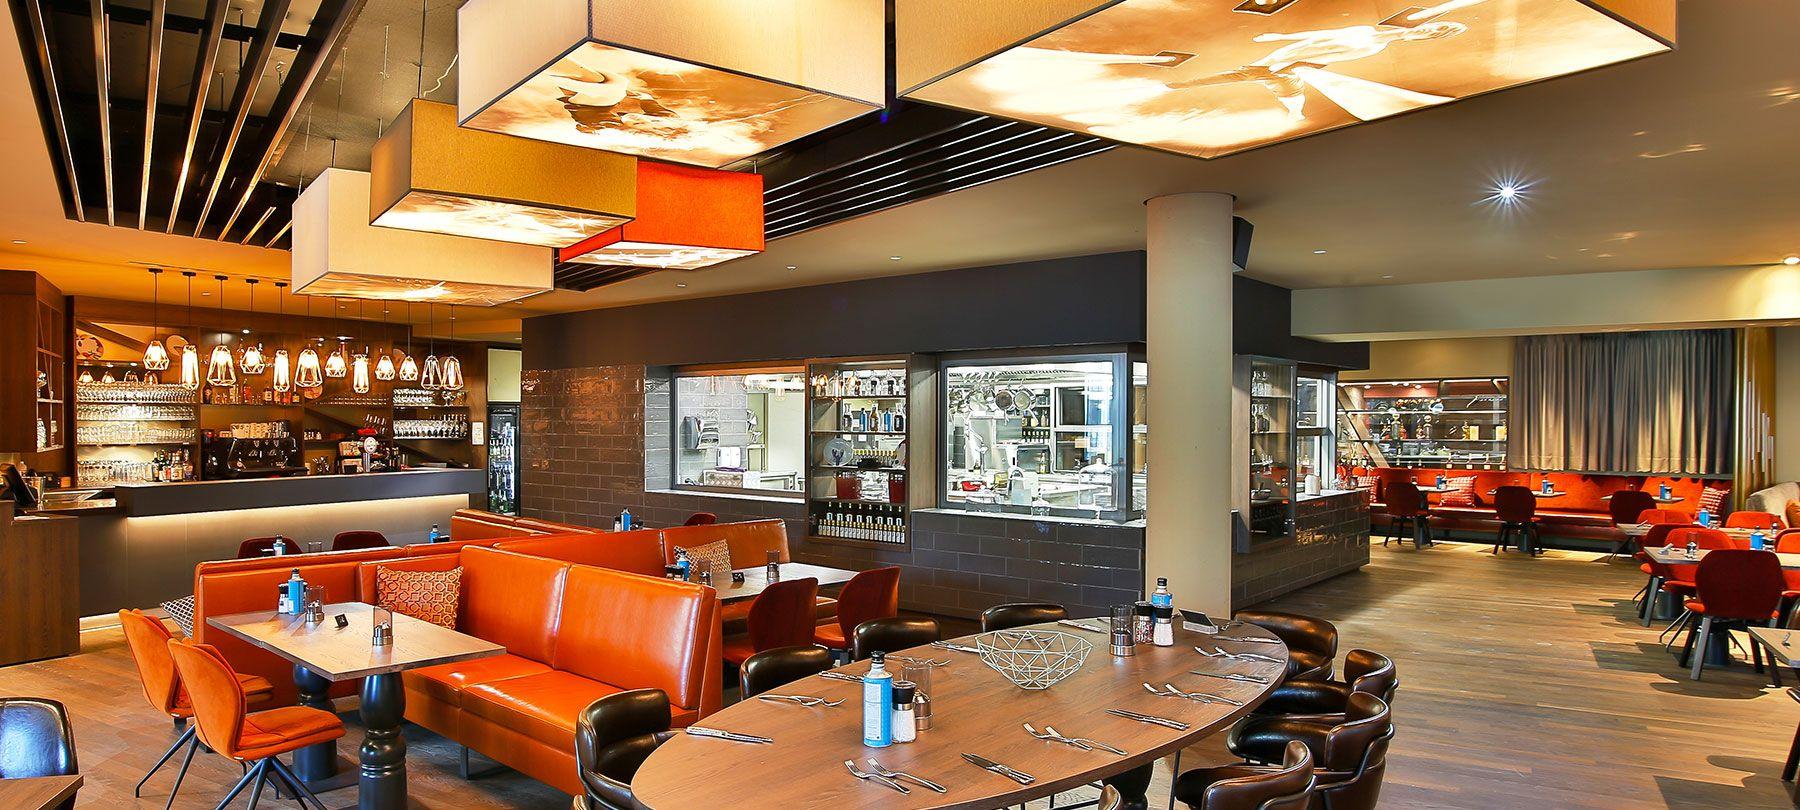 Restaurant_Bar  GOP Bonn Leander Restaurant Design by Kitzig Interior Design